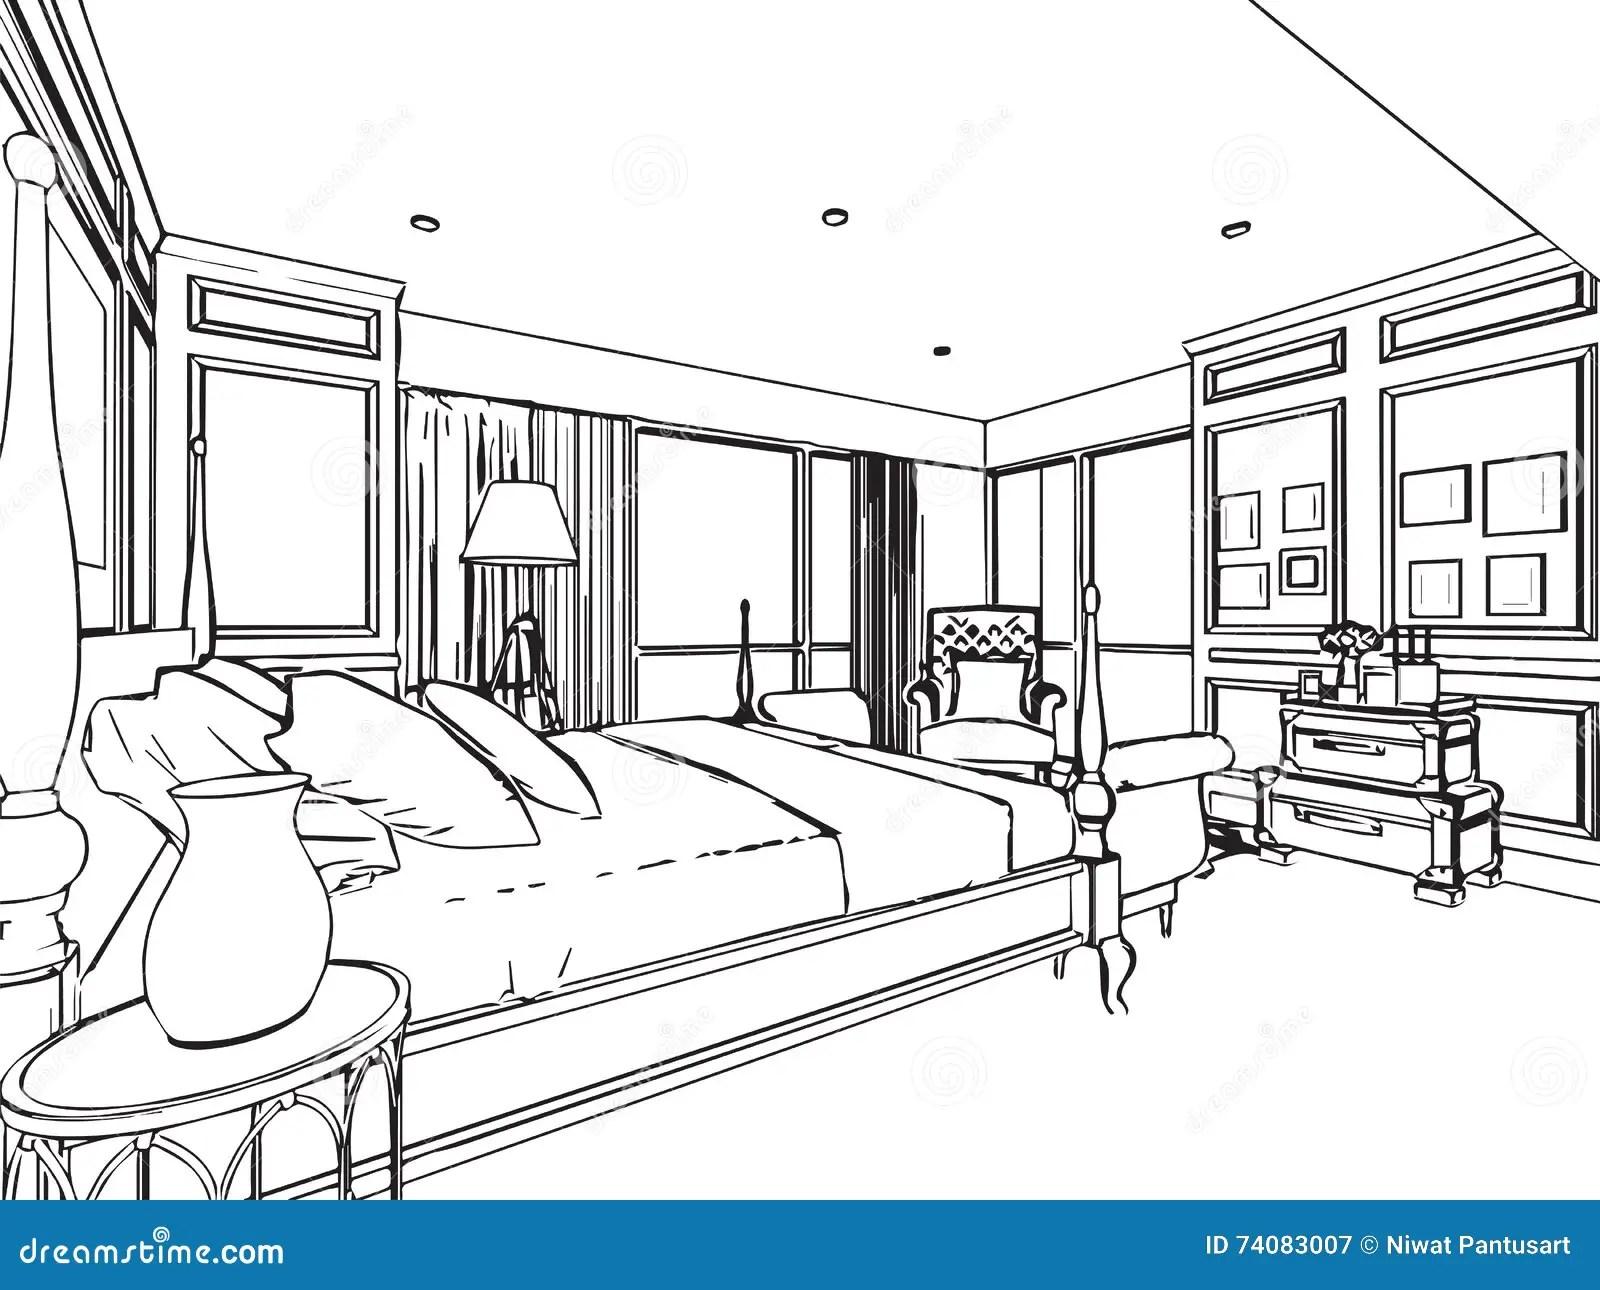 Perspectiva Interior Del Dibujo De Bosquejo Del Esquema De La Casa Ilustracion Del Vector